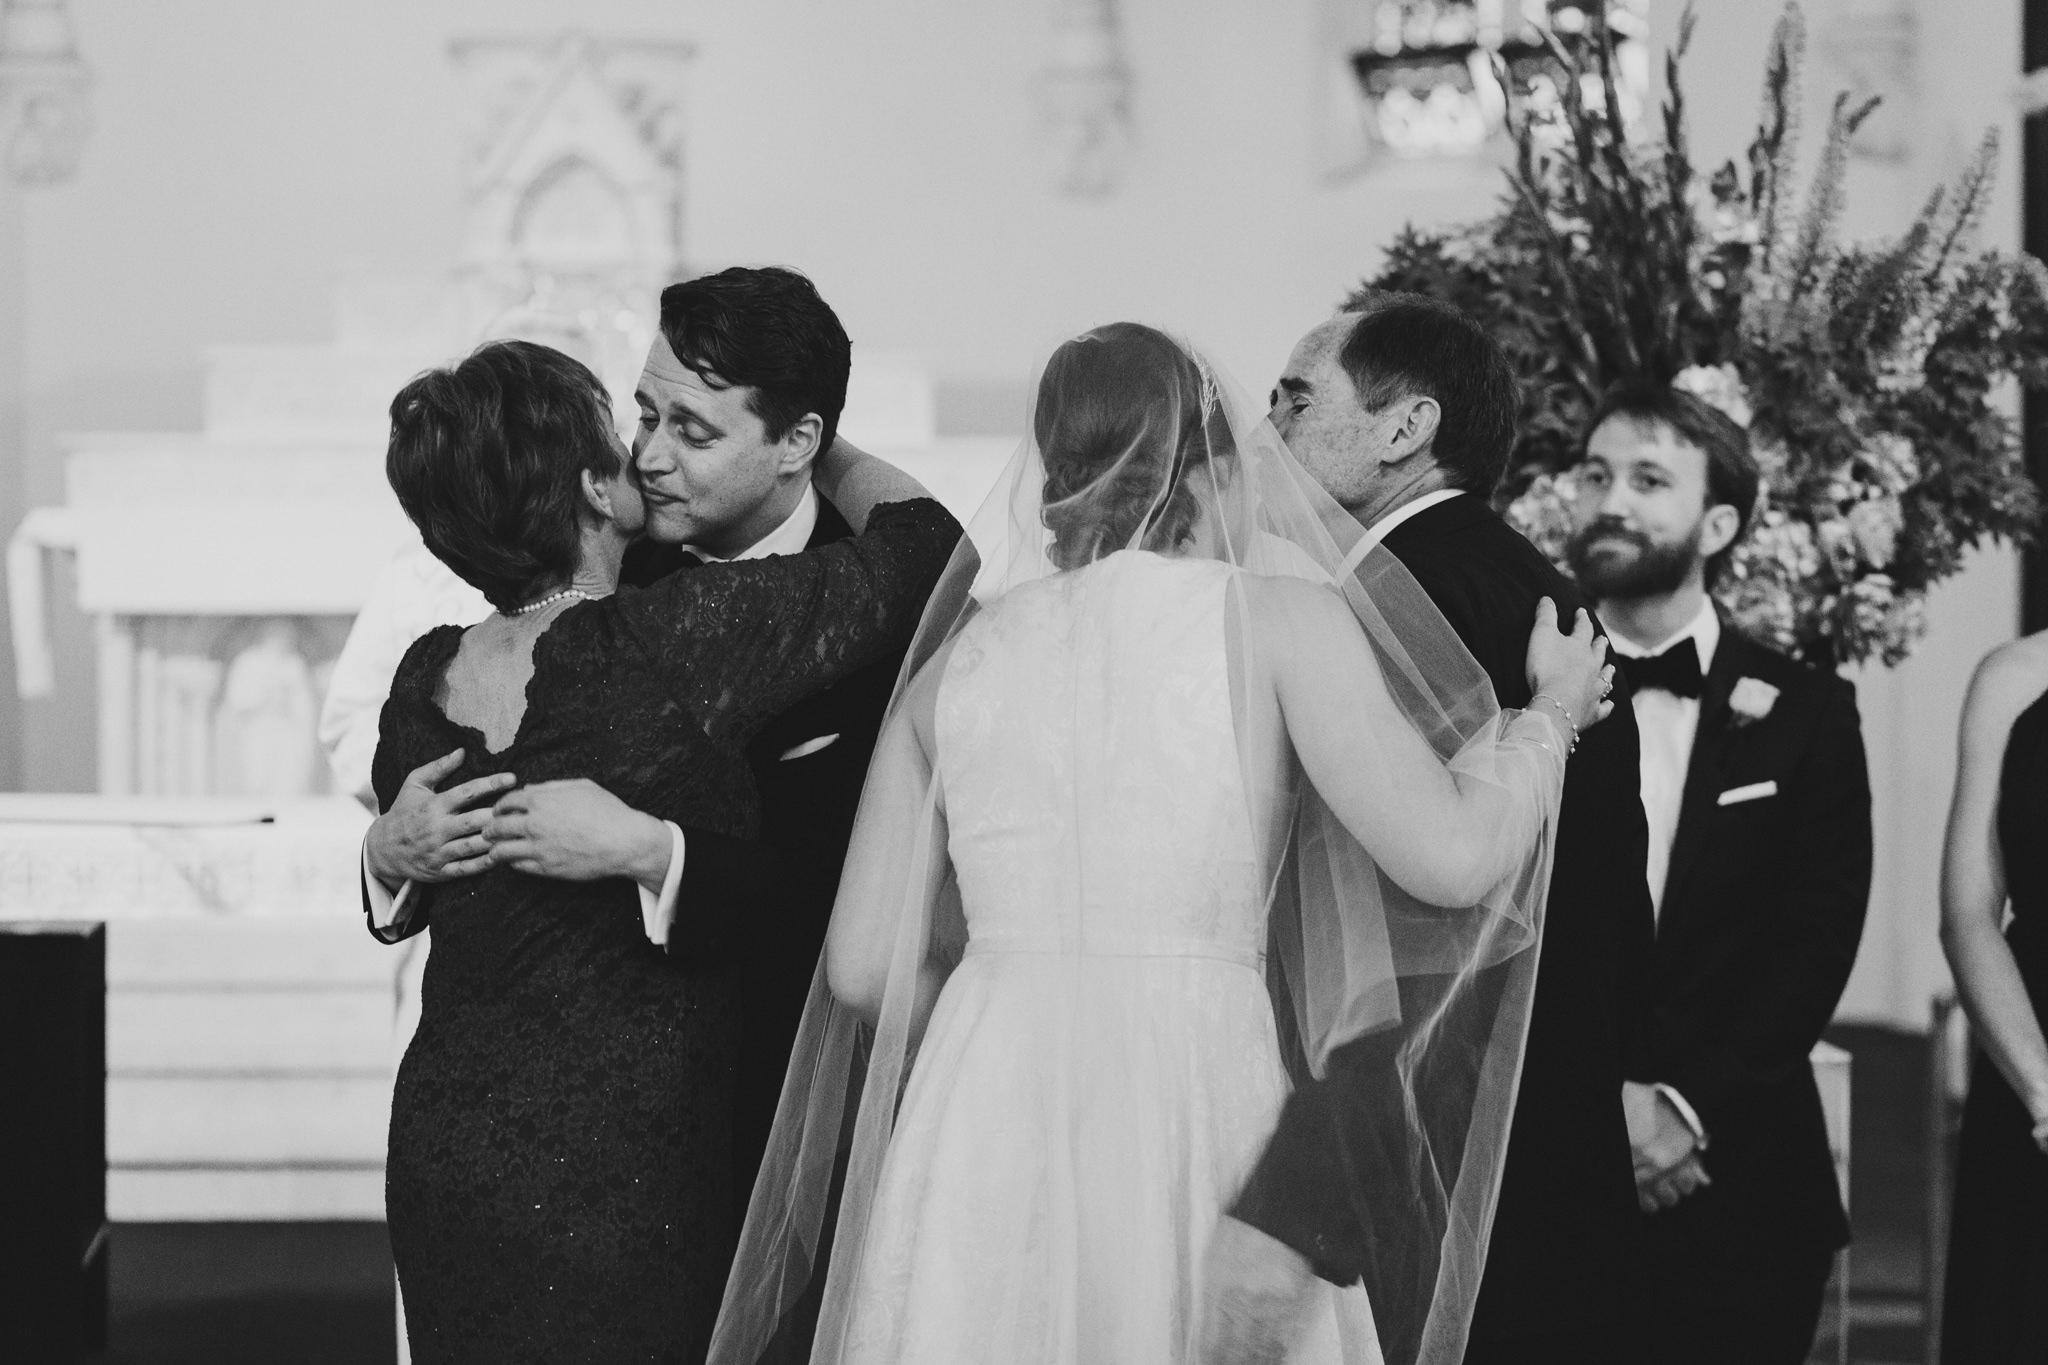 Abbotsford_Convent_Wedding_Peter_Anna051.JPG